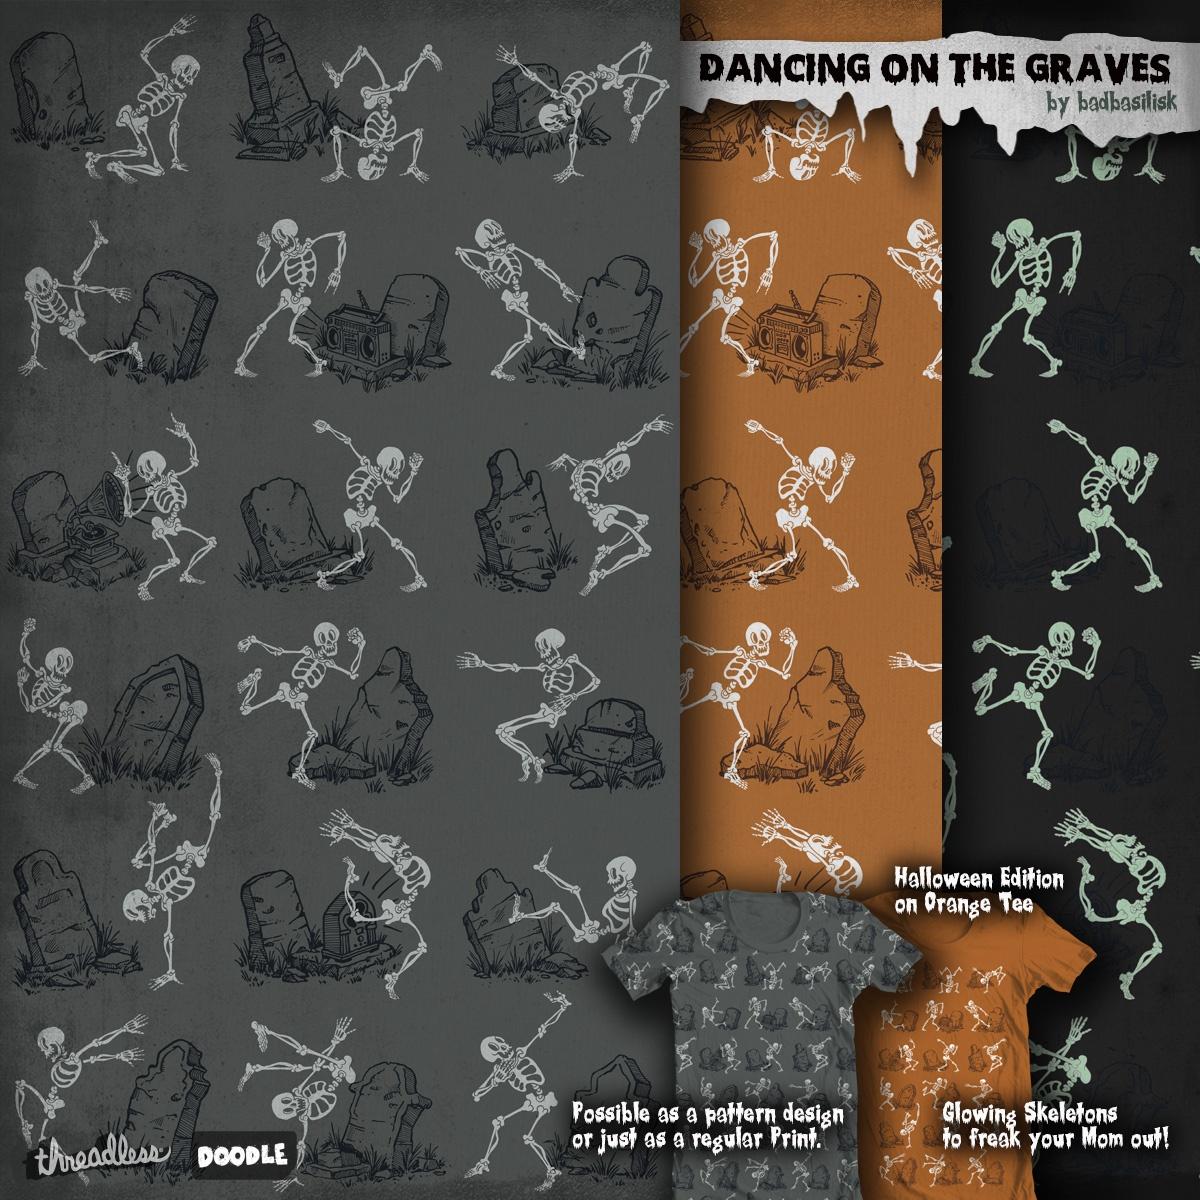 Dancing on the Graves by badbasilisk on Threadless